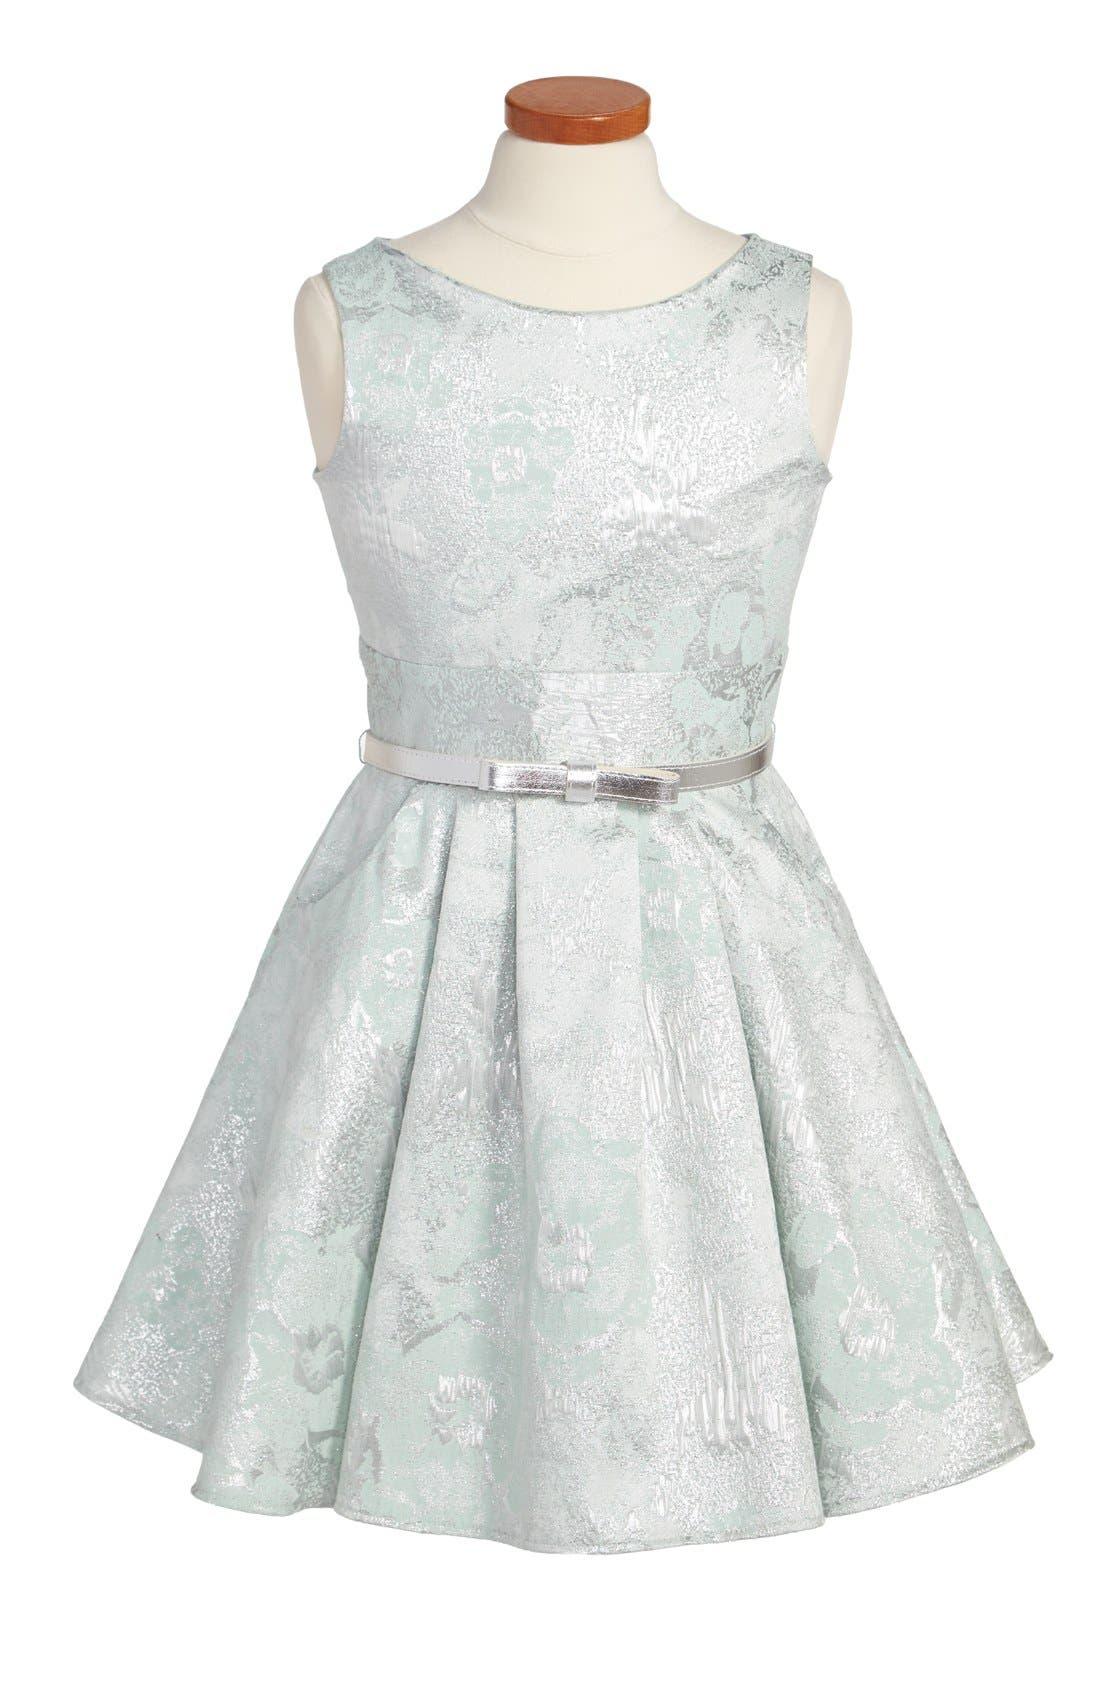 Main Image - Zoe Ltd Metallic Brocade Sleeveless Dress (Big Girls)